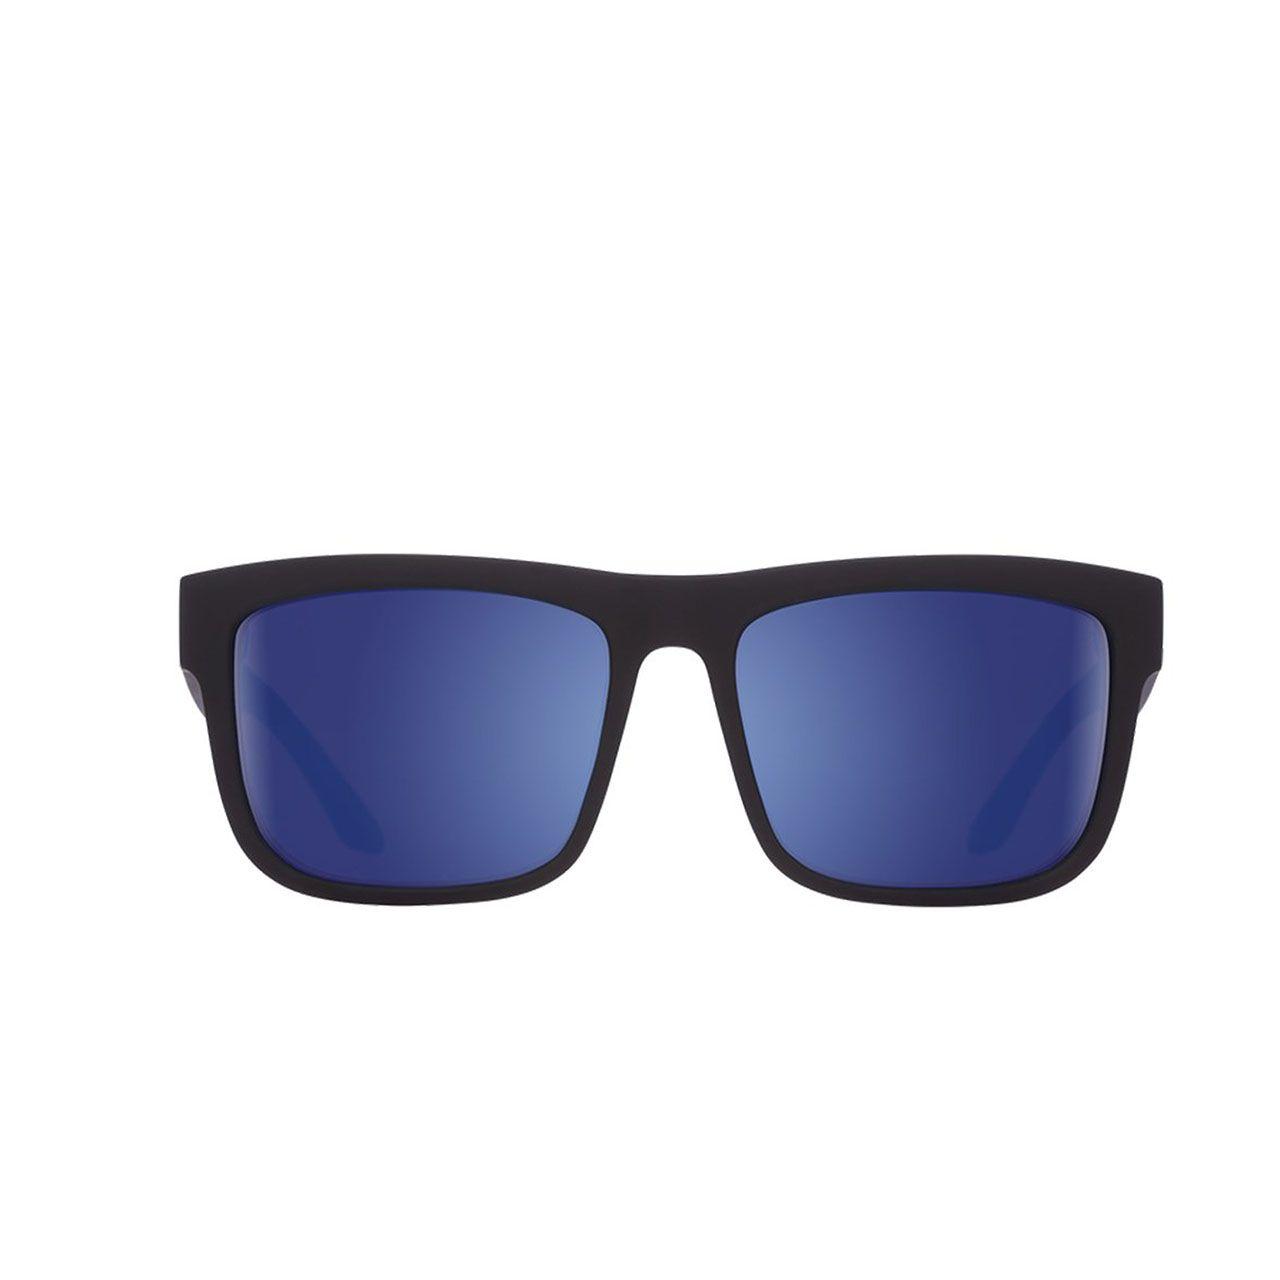 عینک آفتابی اسپای سری Discord مدلSoft Matte Black Navy Tort Happy Gray Green Dark Blue Spectra -  - 4